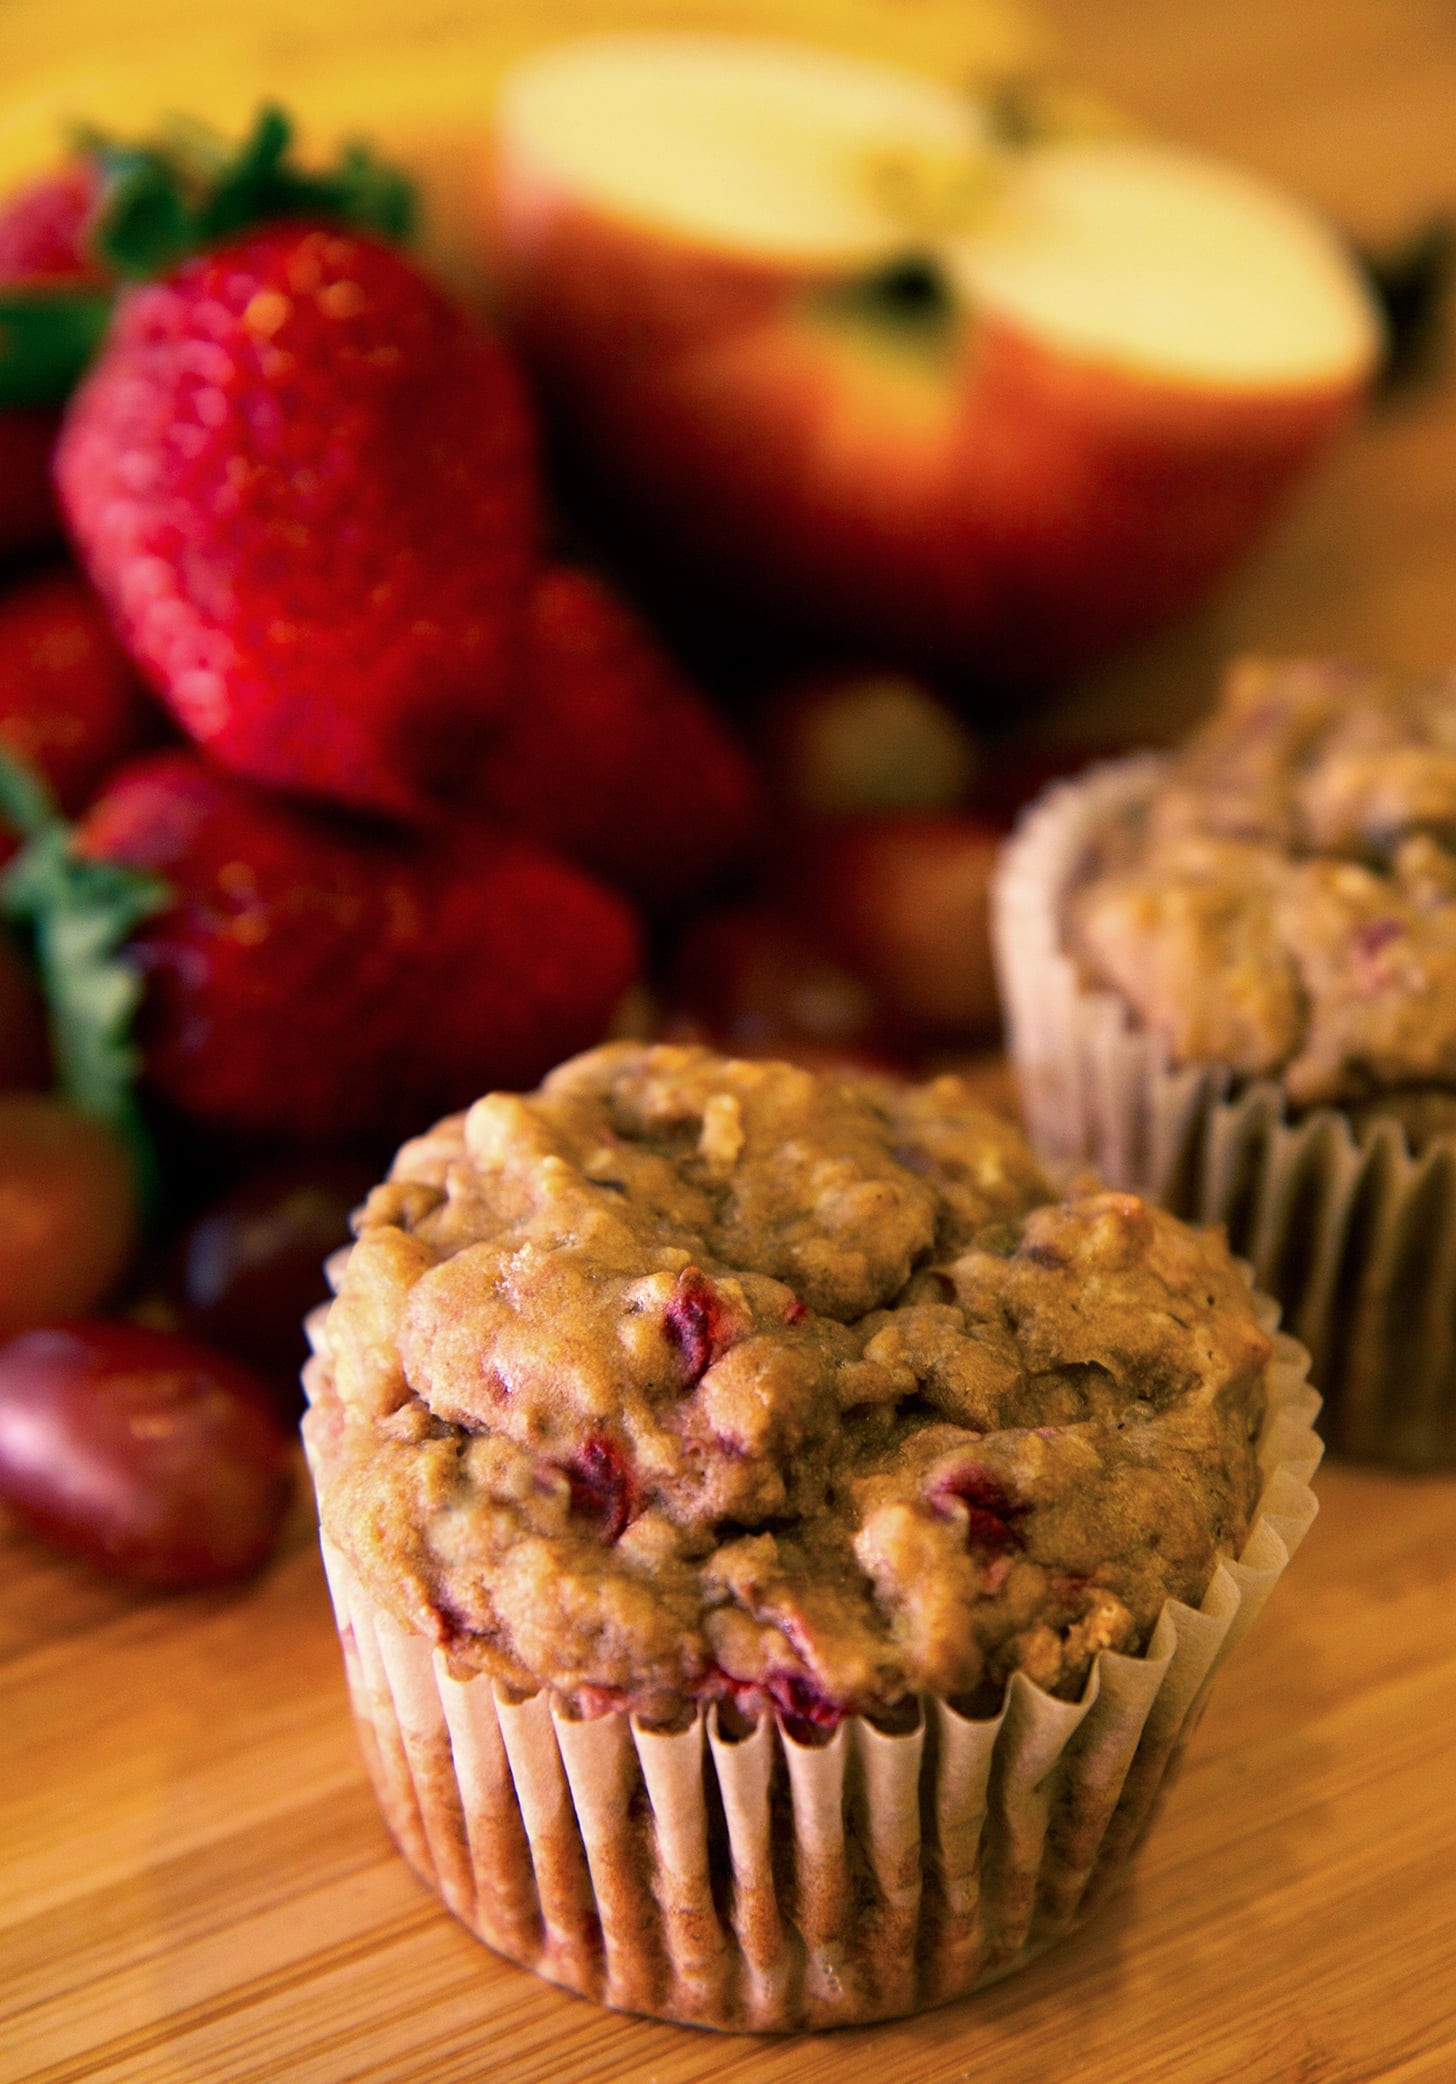 vegan banana muffin recipe popsugar fitness uk. Black Bedroom Furniture Sets. Home Design Ideas